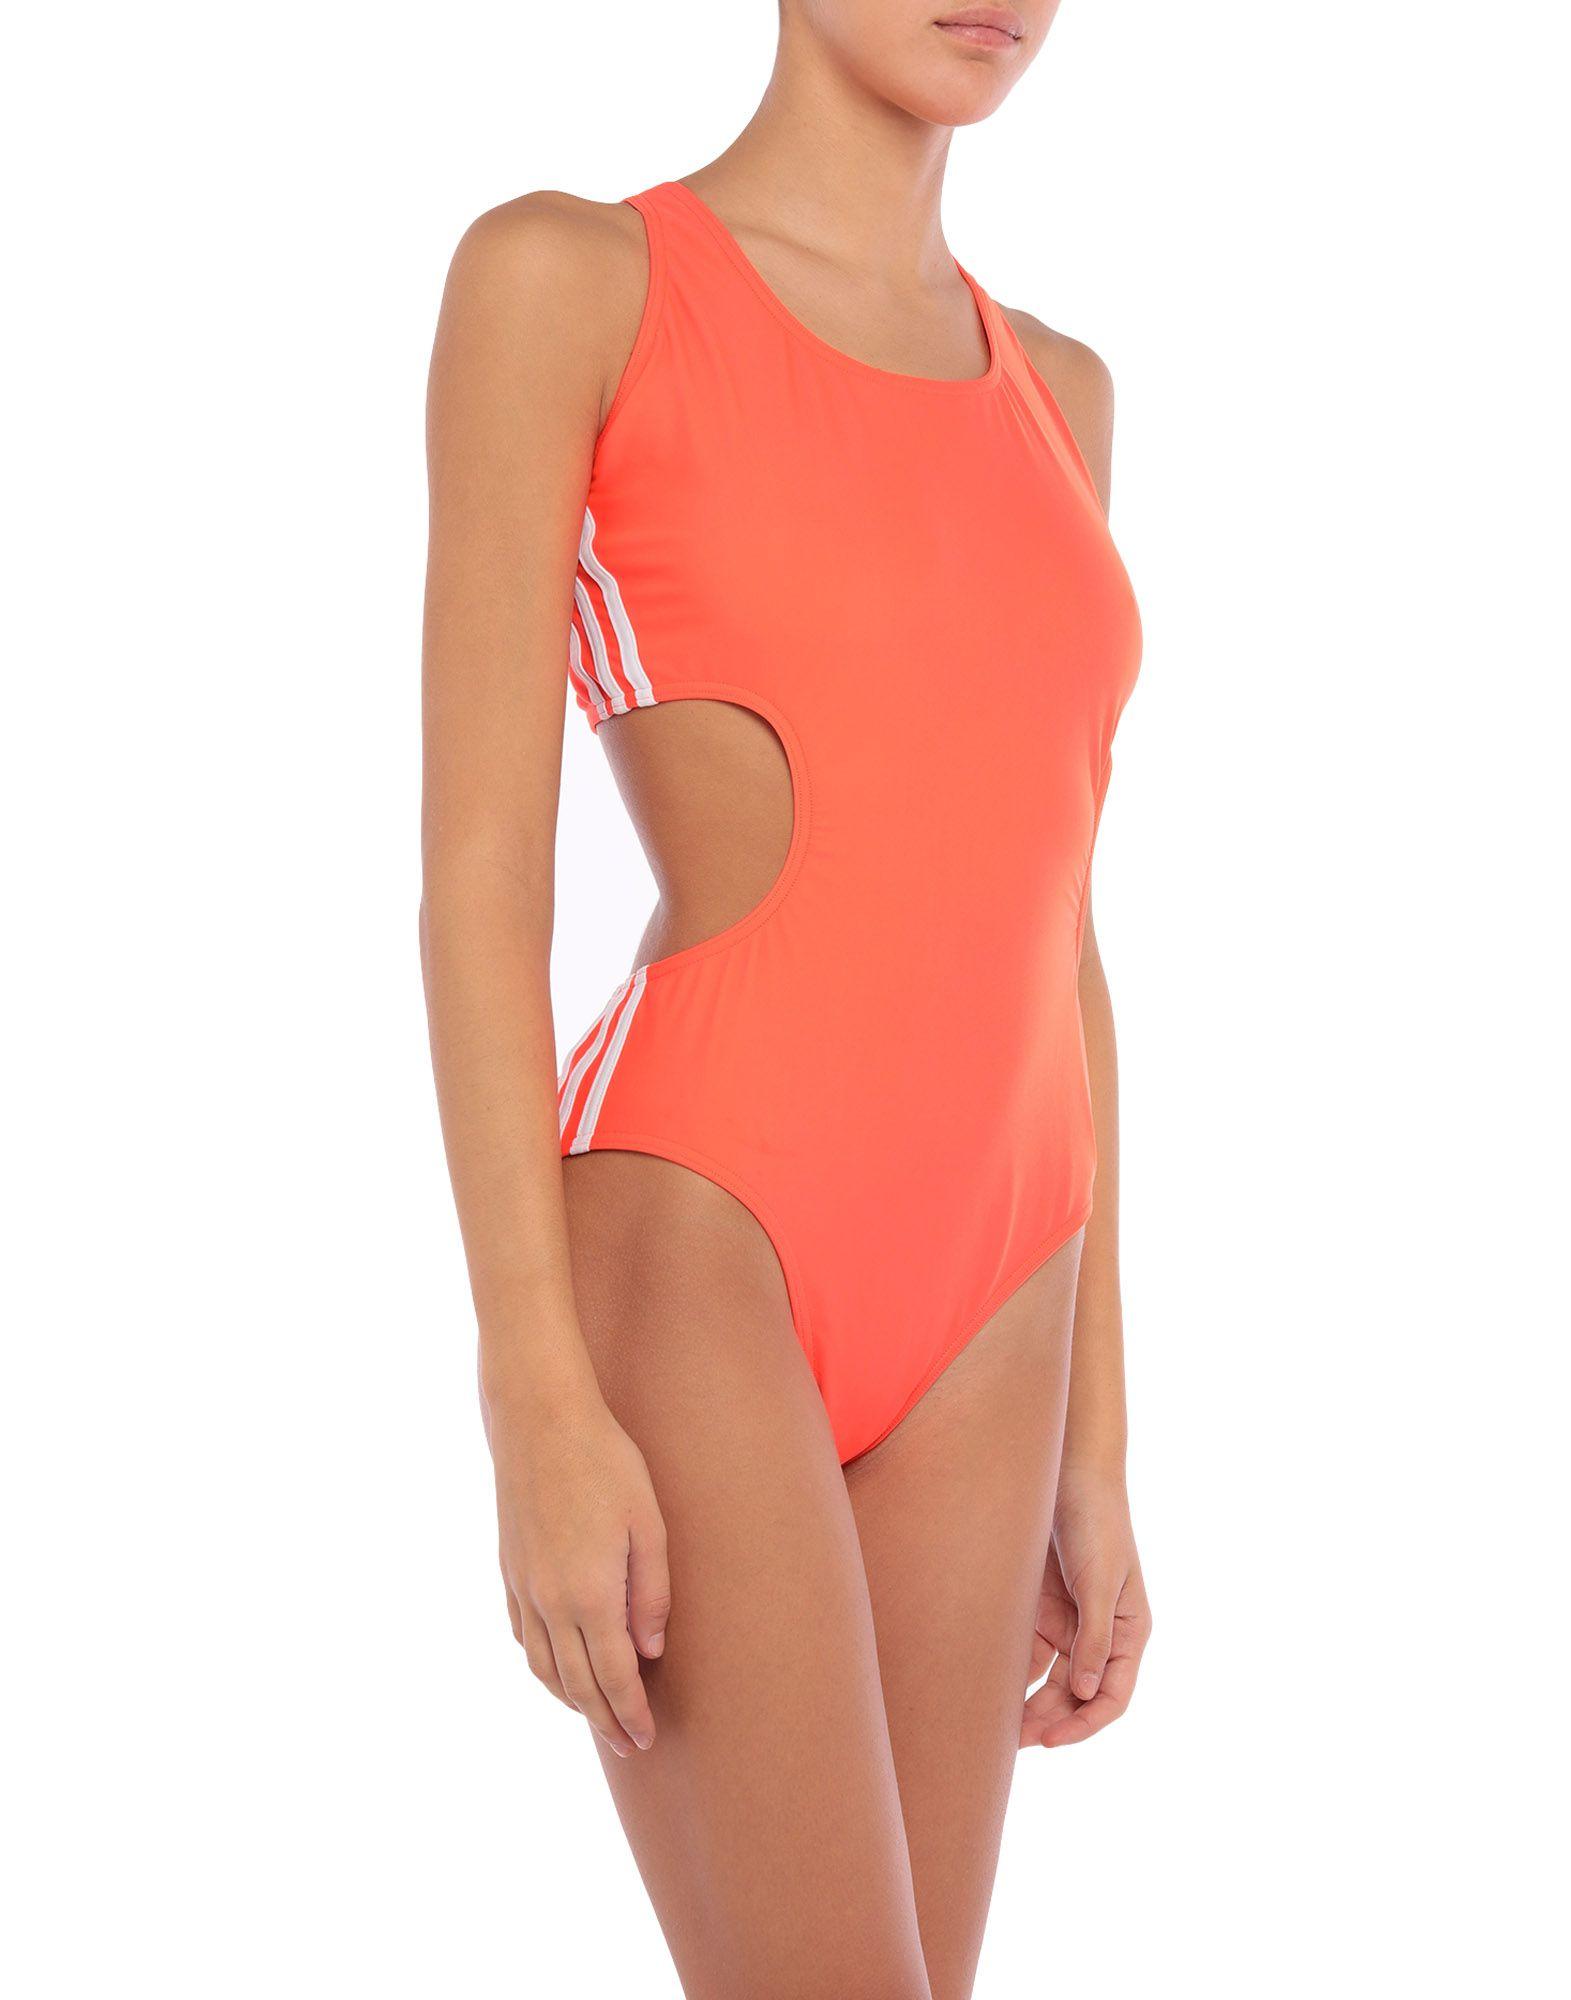 ADIDAS ORIGINALS x FIORUCCI One-piece swimsuits - Item 47255629